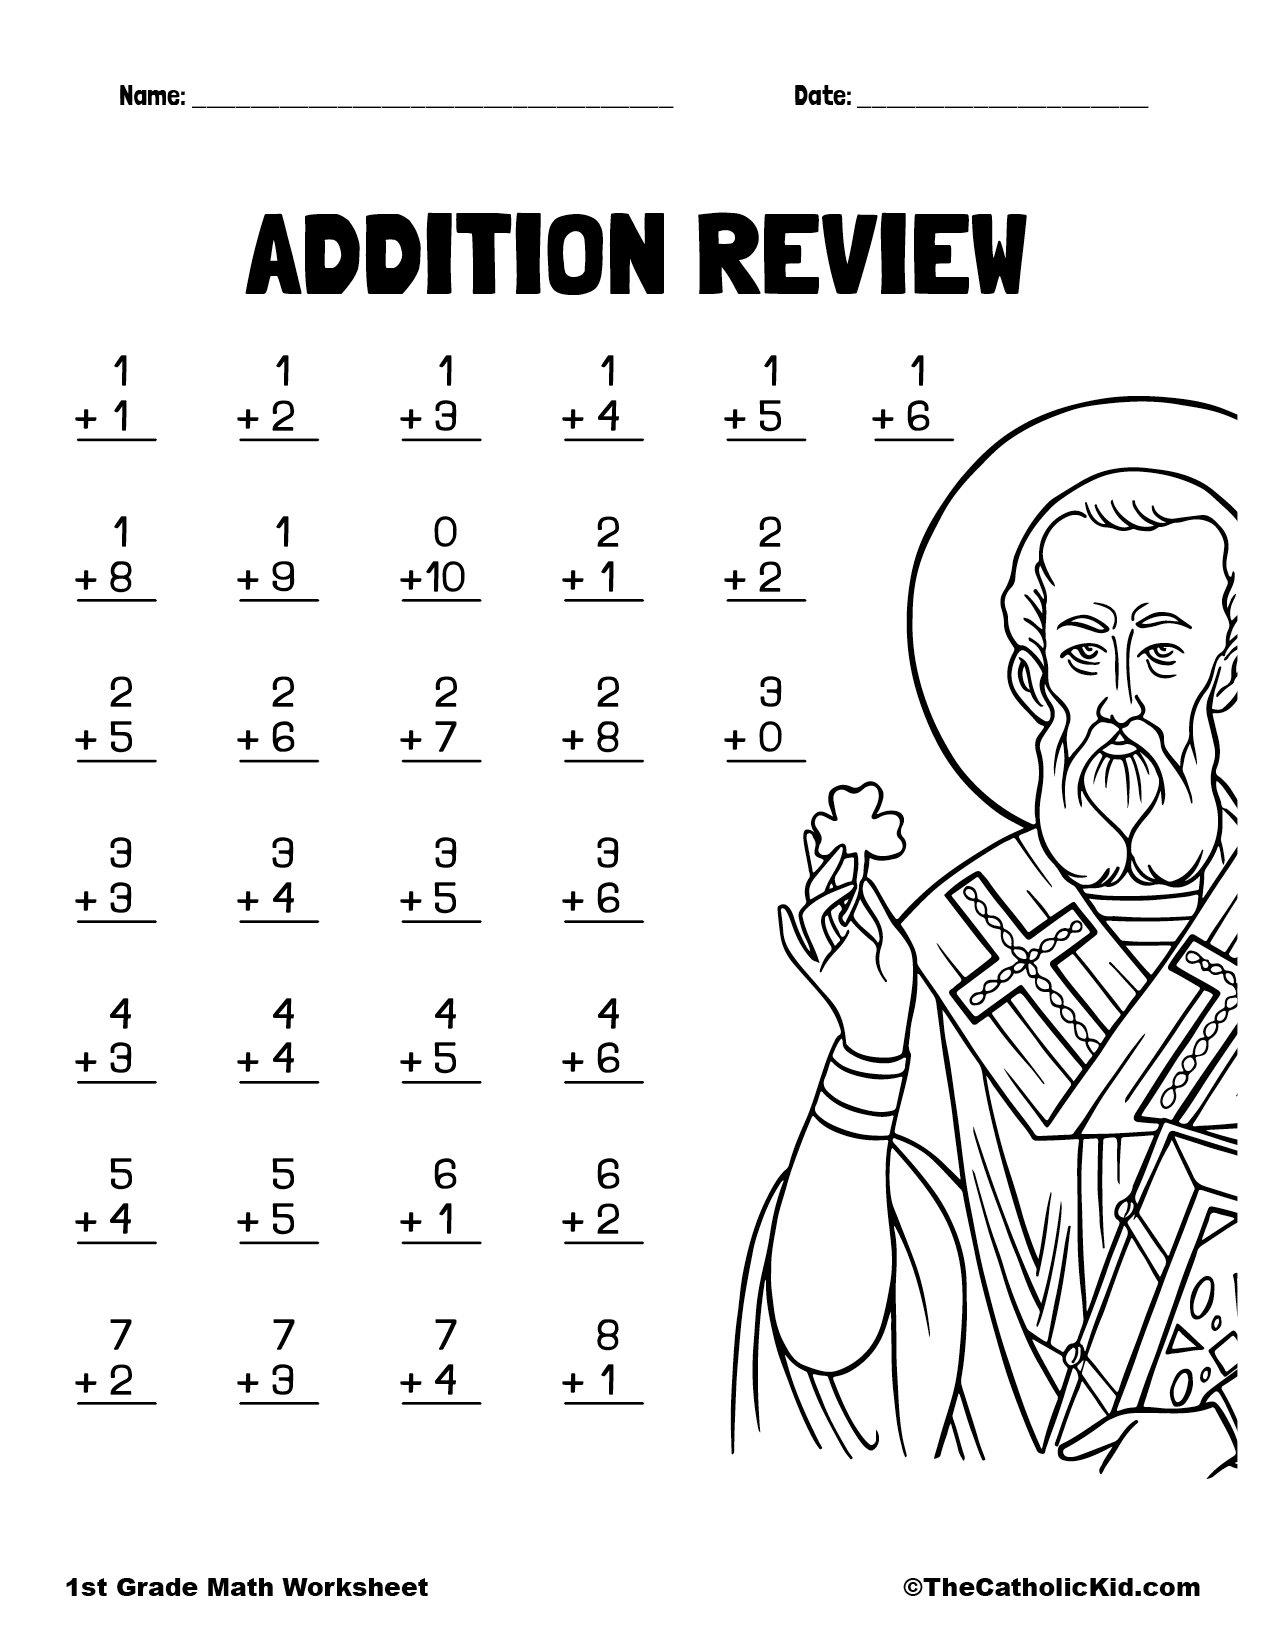 Adding Review Printout - 1st Grade Math Worksheet Catholic